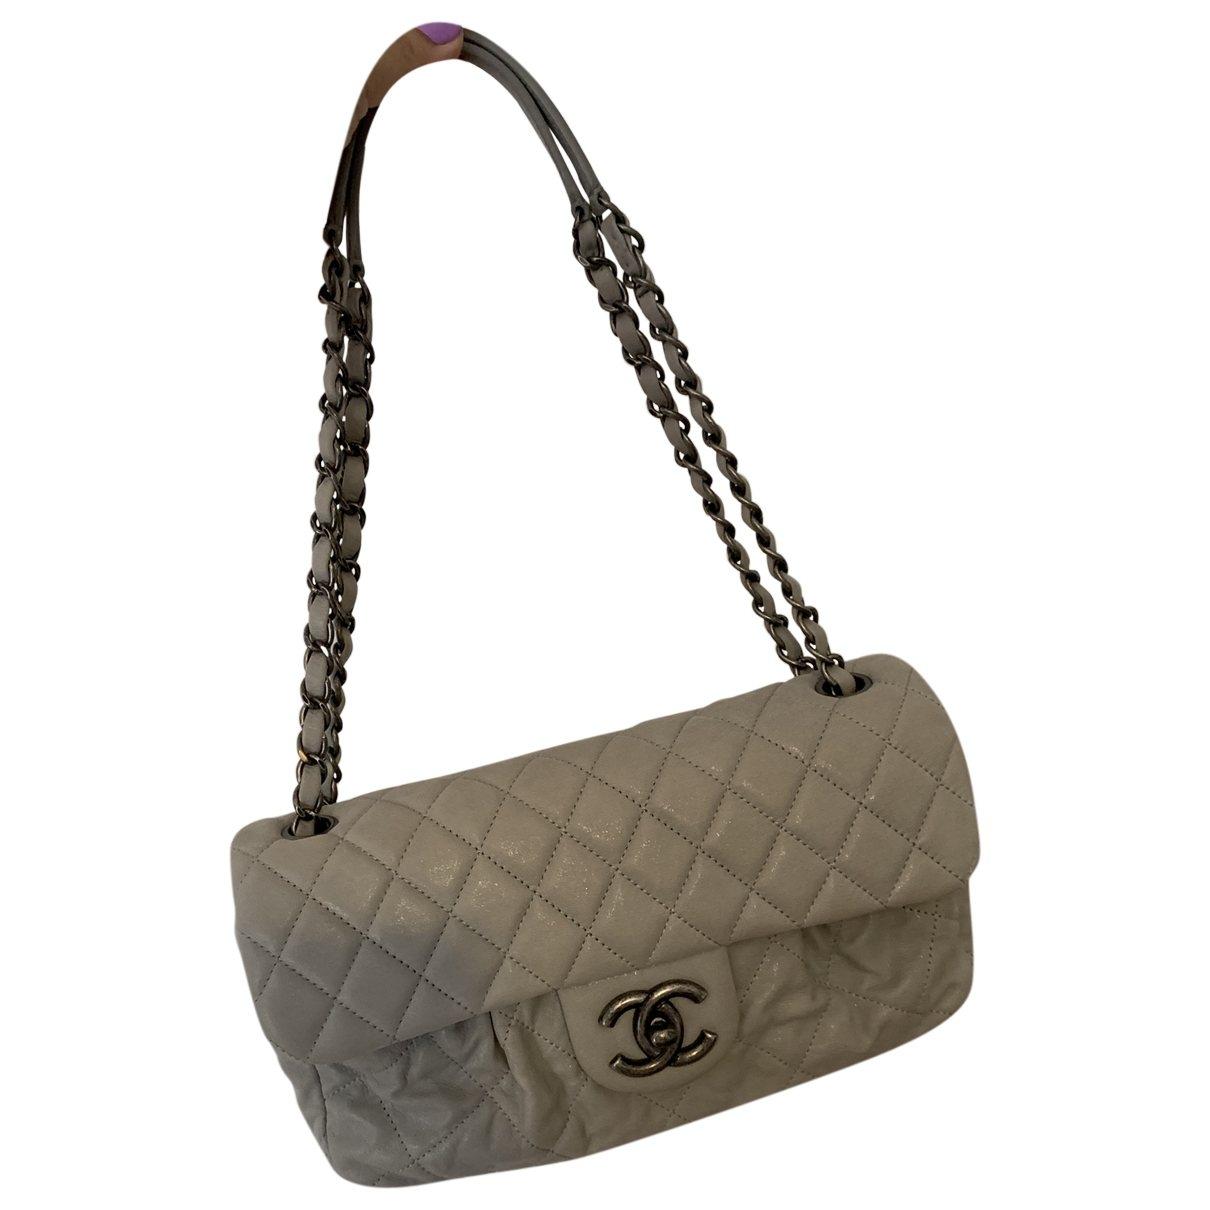 Chanel Timeless/Classique Handtasche in  Grau Leder